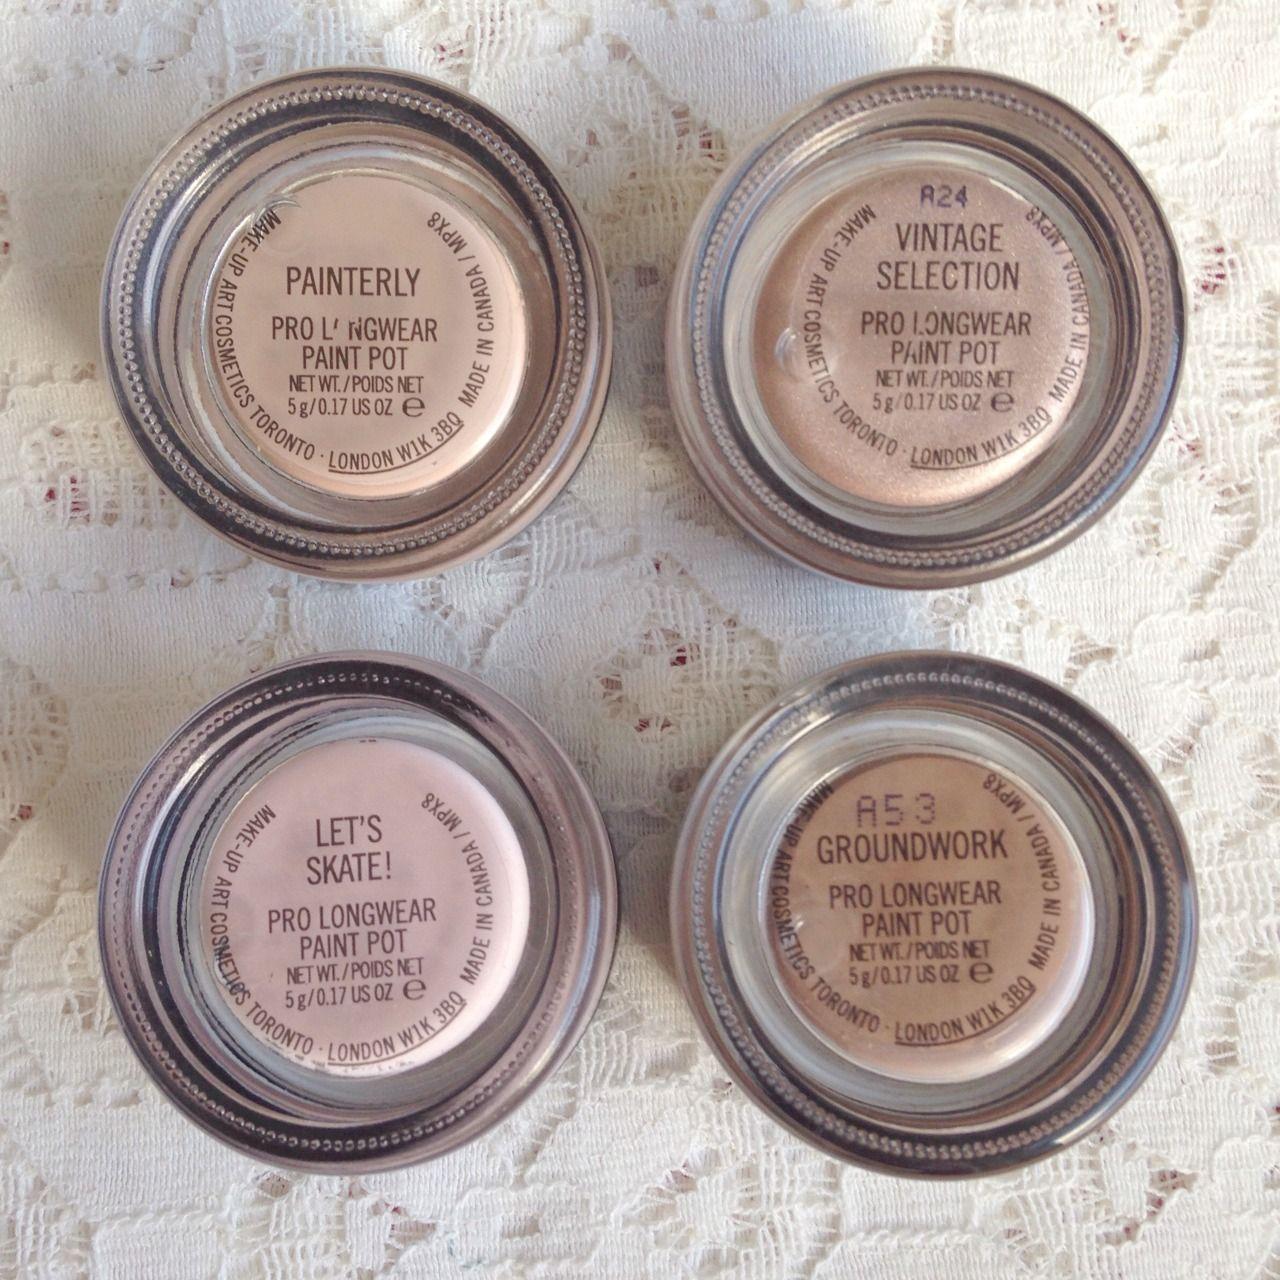 Mac paint pot collection, cream eyeshadow, painterly